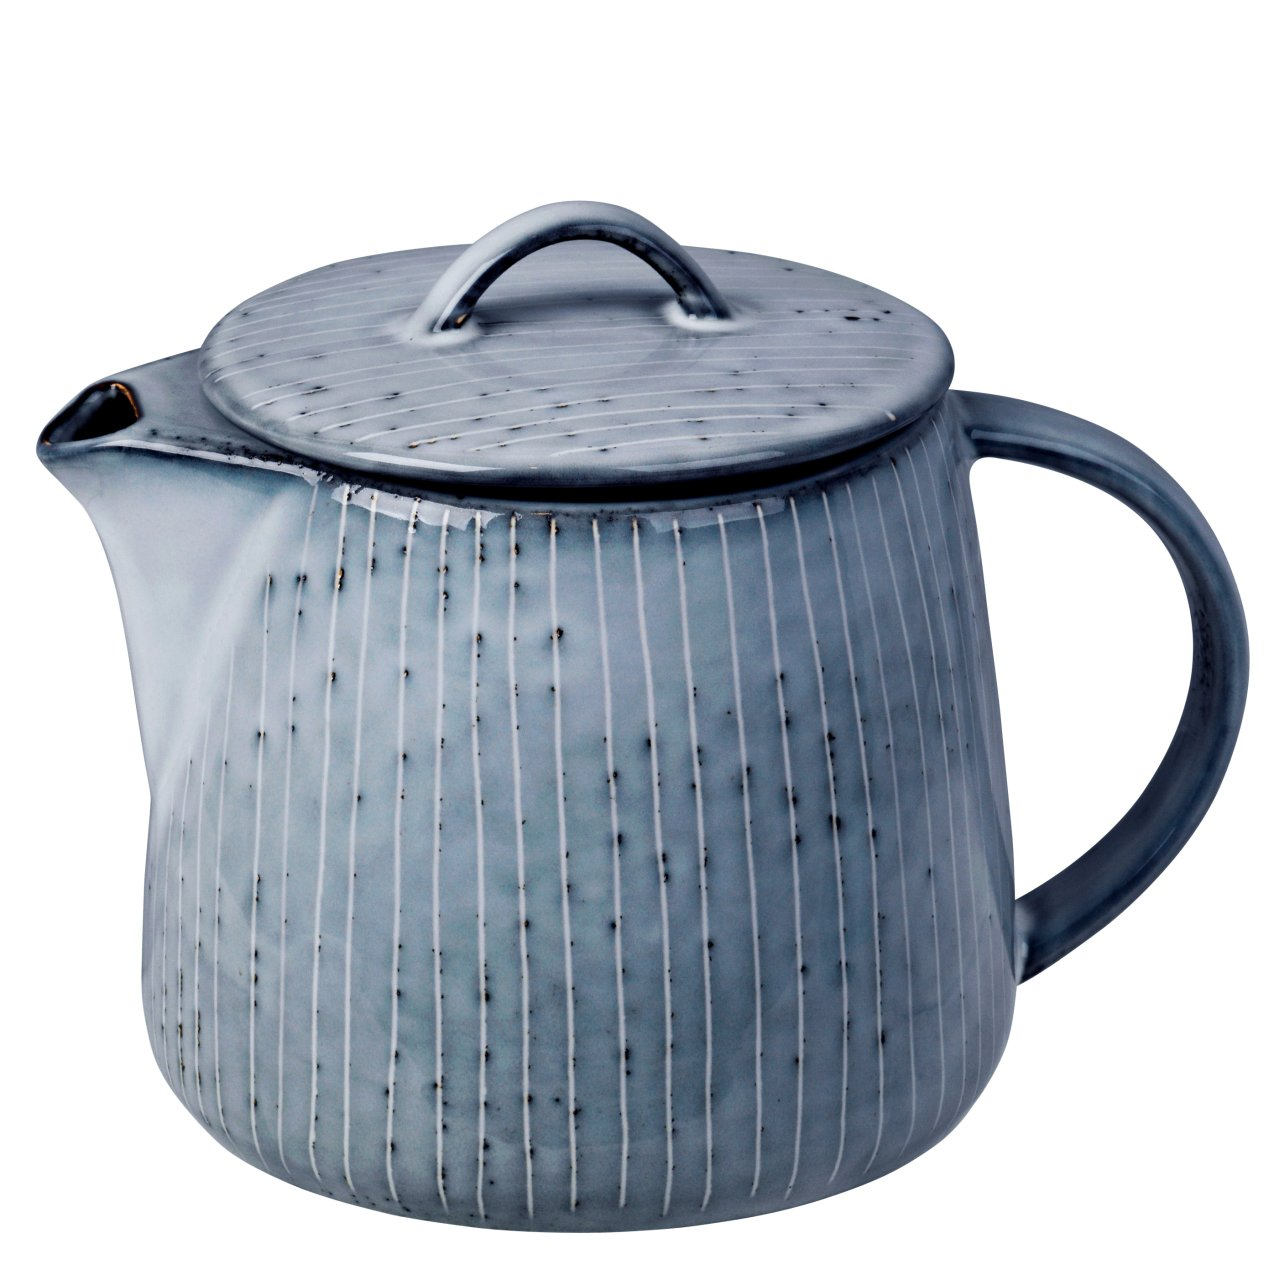 Broste Nordic Sea Teekanne gestreift 20 L blau grau